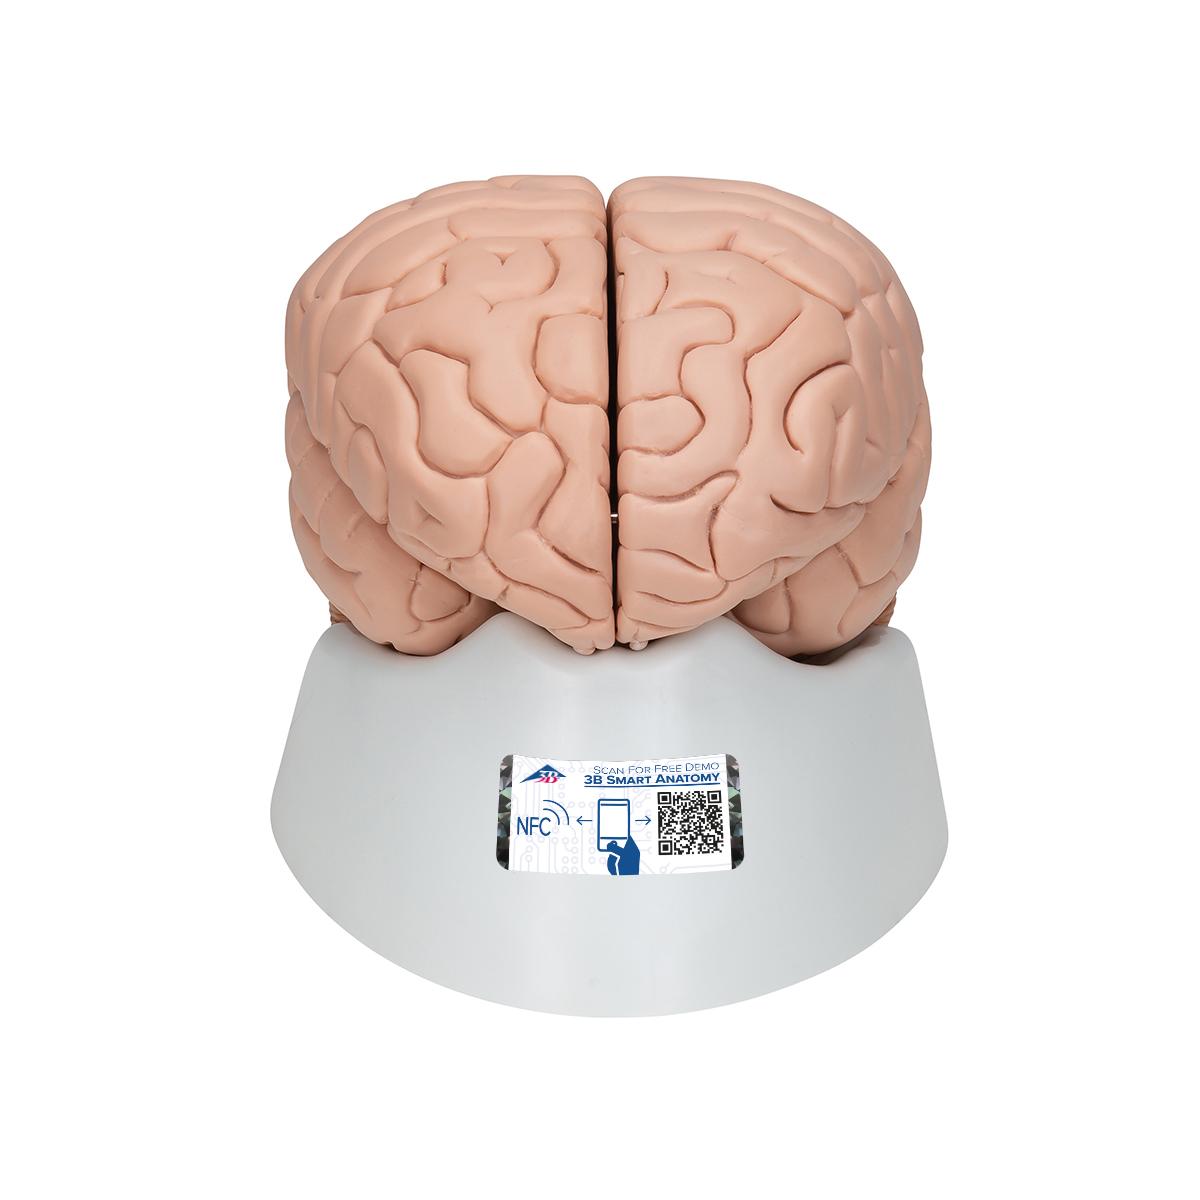 Gehirn, 8-teilig - 1000225 - 3B Scientific - C17 - Gehirn Modelle ...